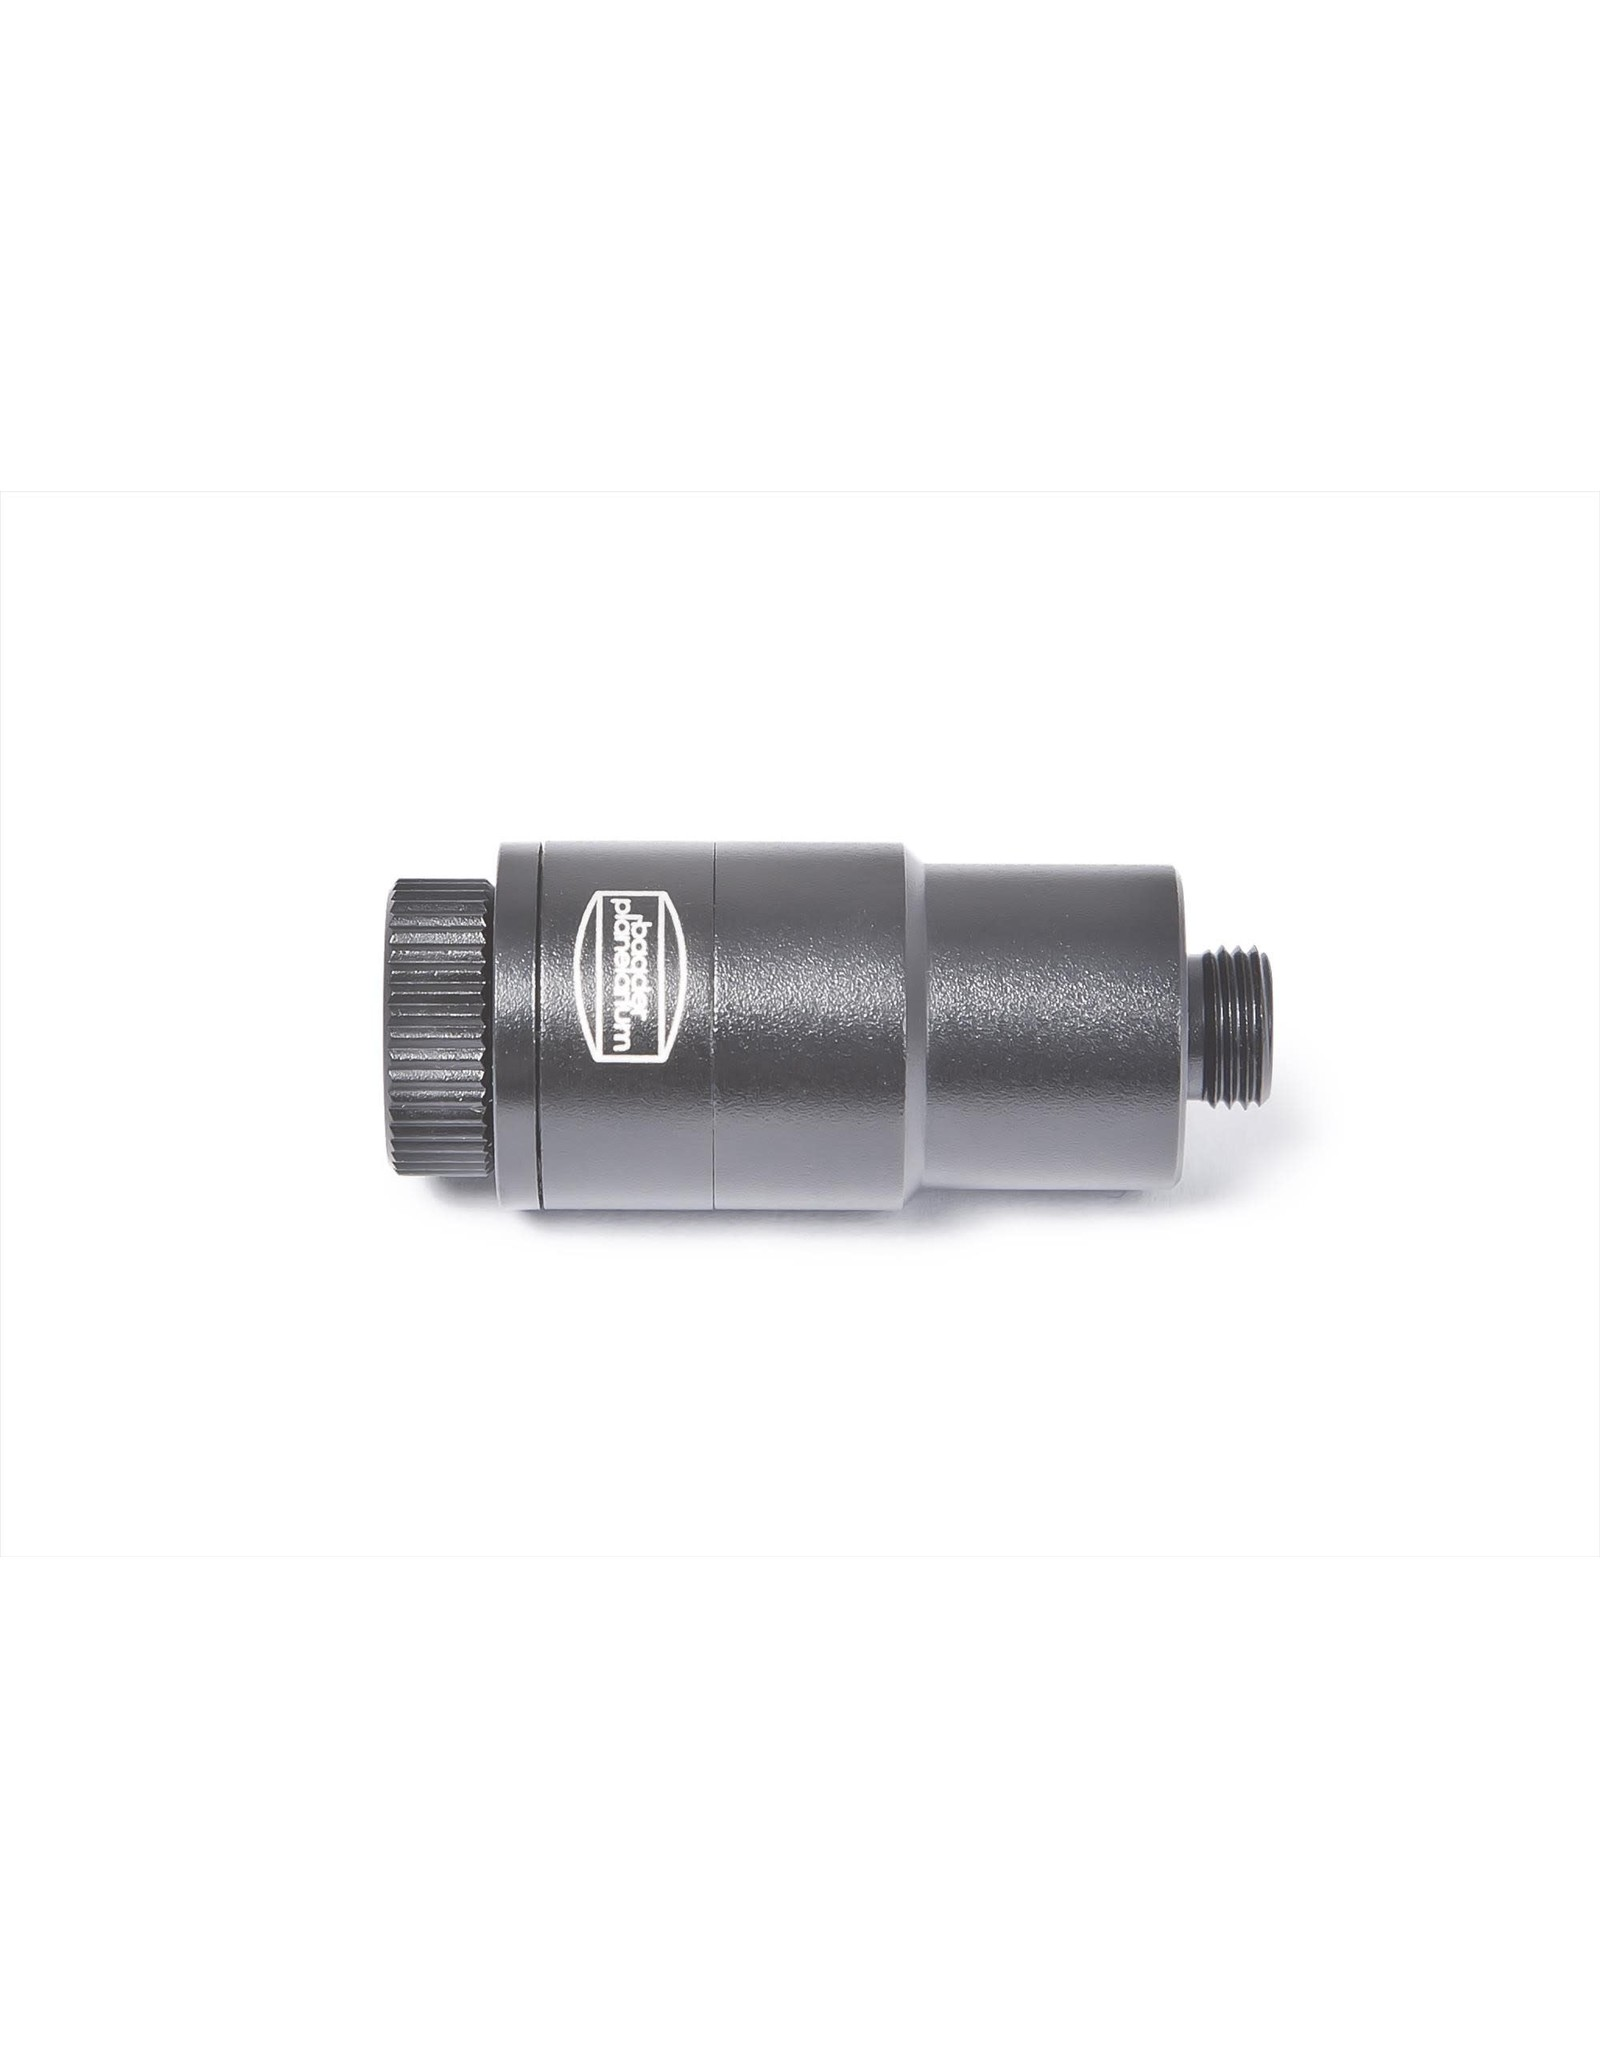 Baader Planetarium Baader Log-Pot Illuminator for Microguide Eyepiece and Illuminated Finders